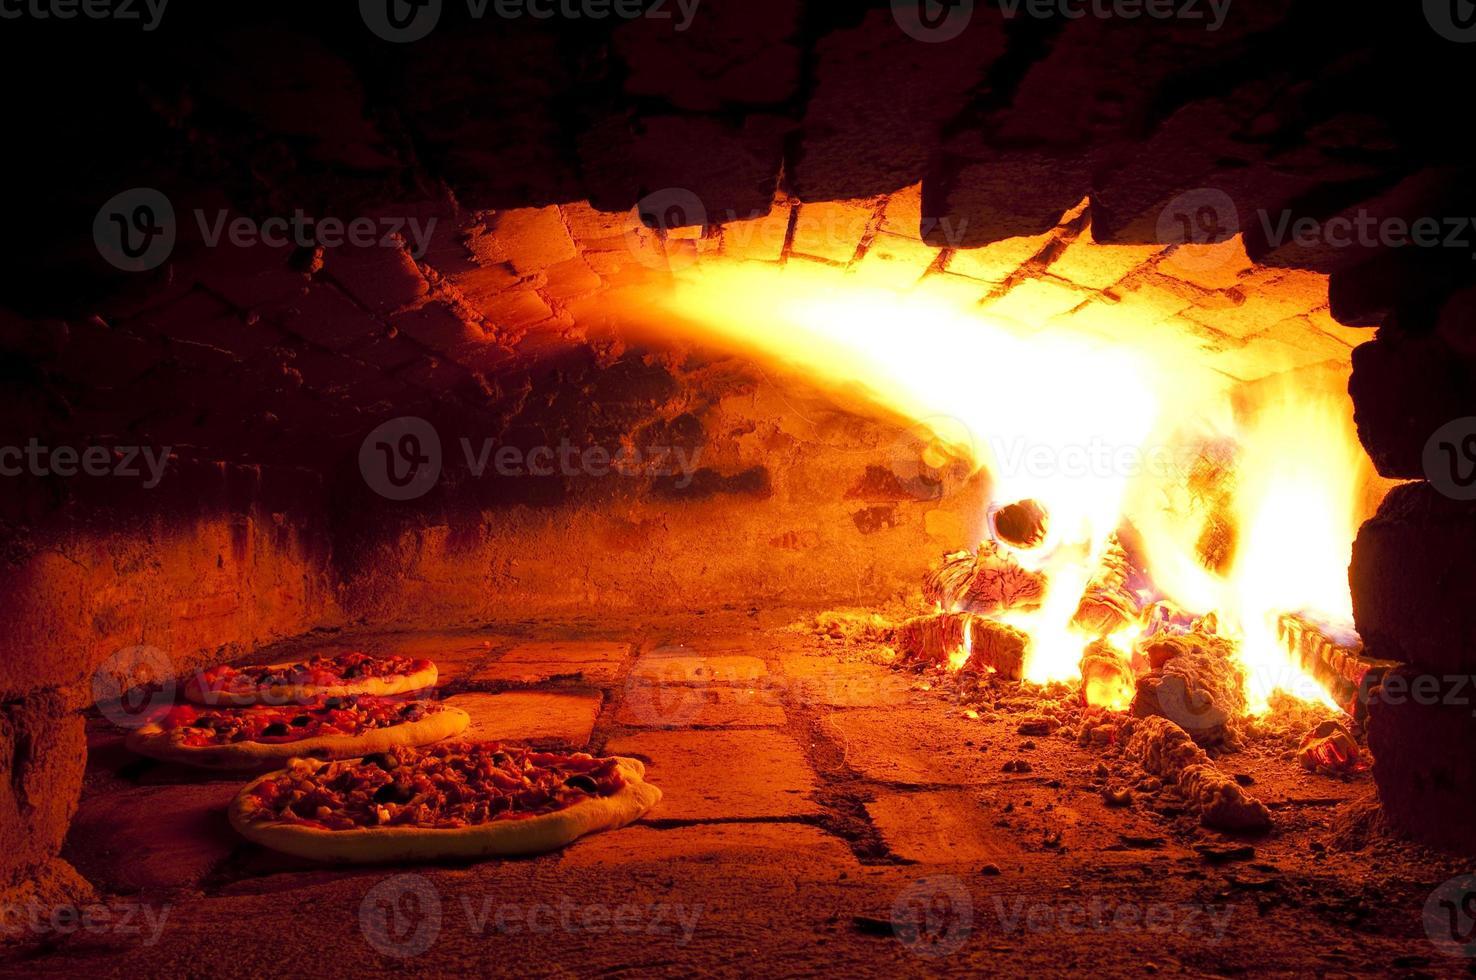 Pizza oven photo